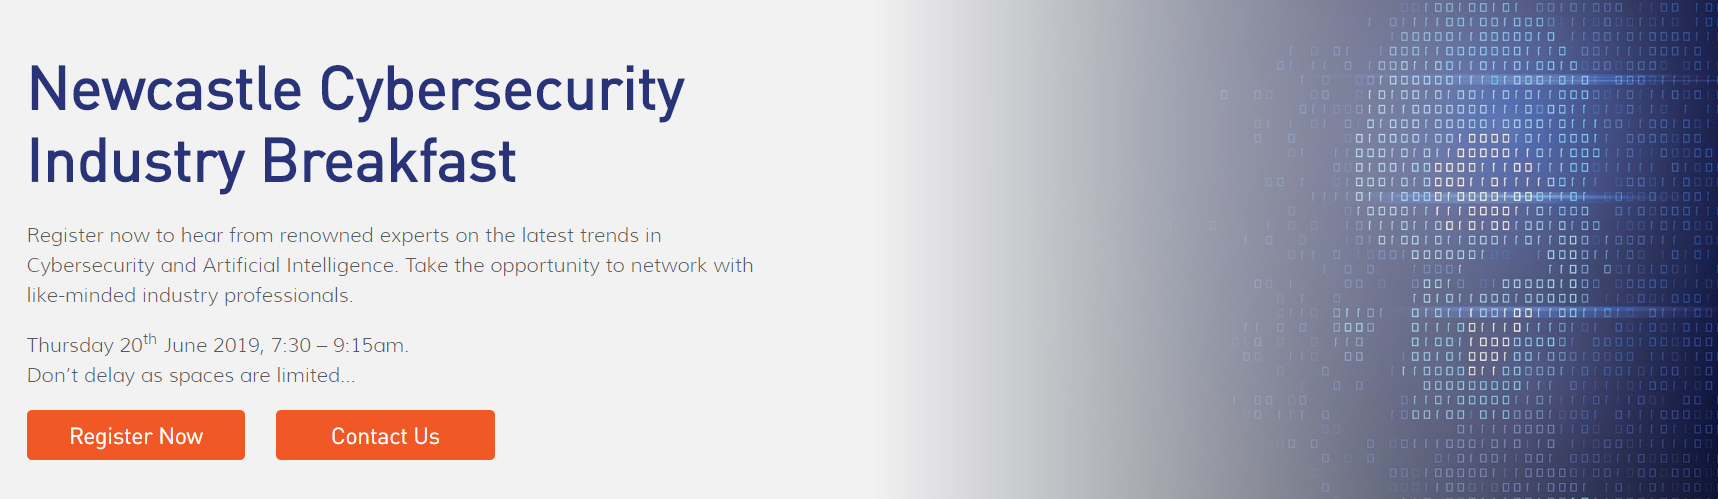 2nd Annual Newcastle Cybersecurity Industry Breakfast